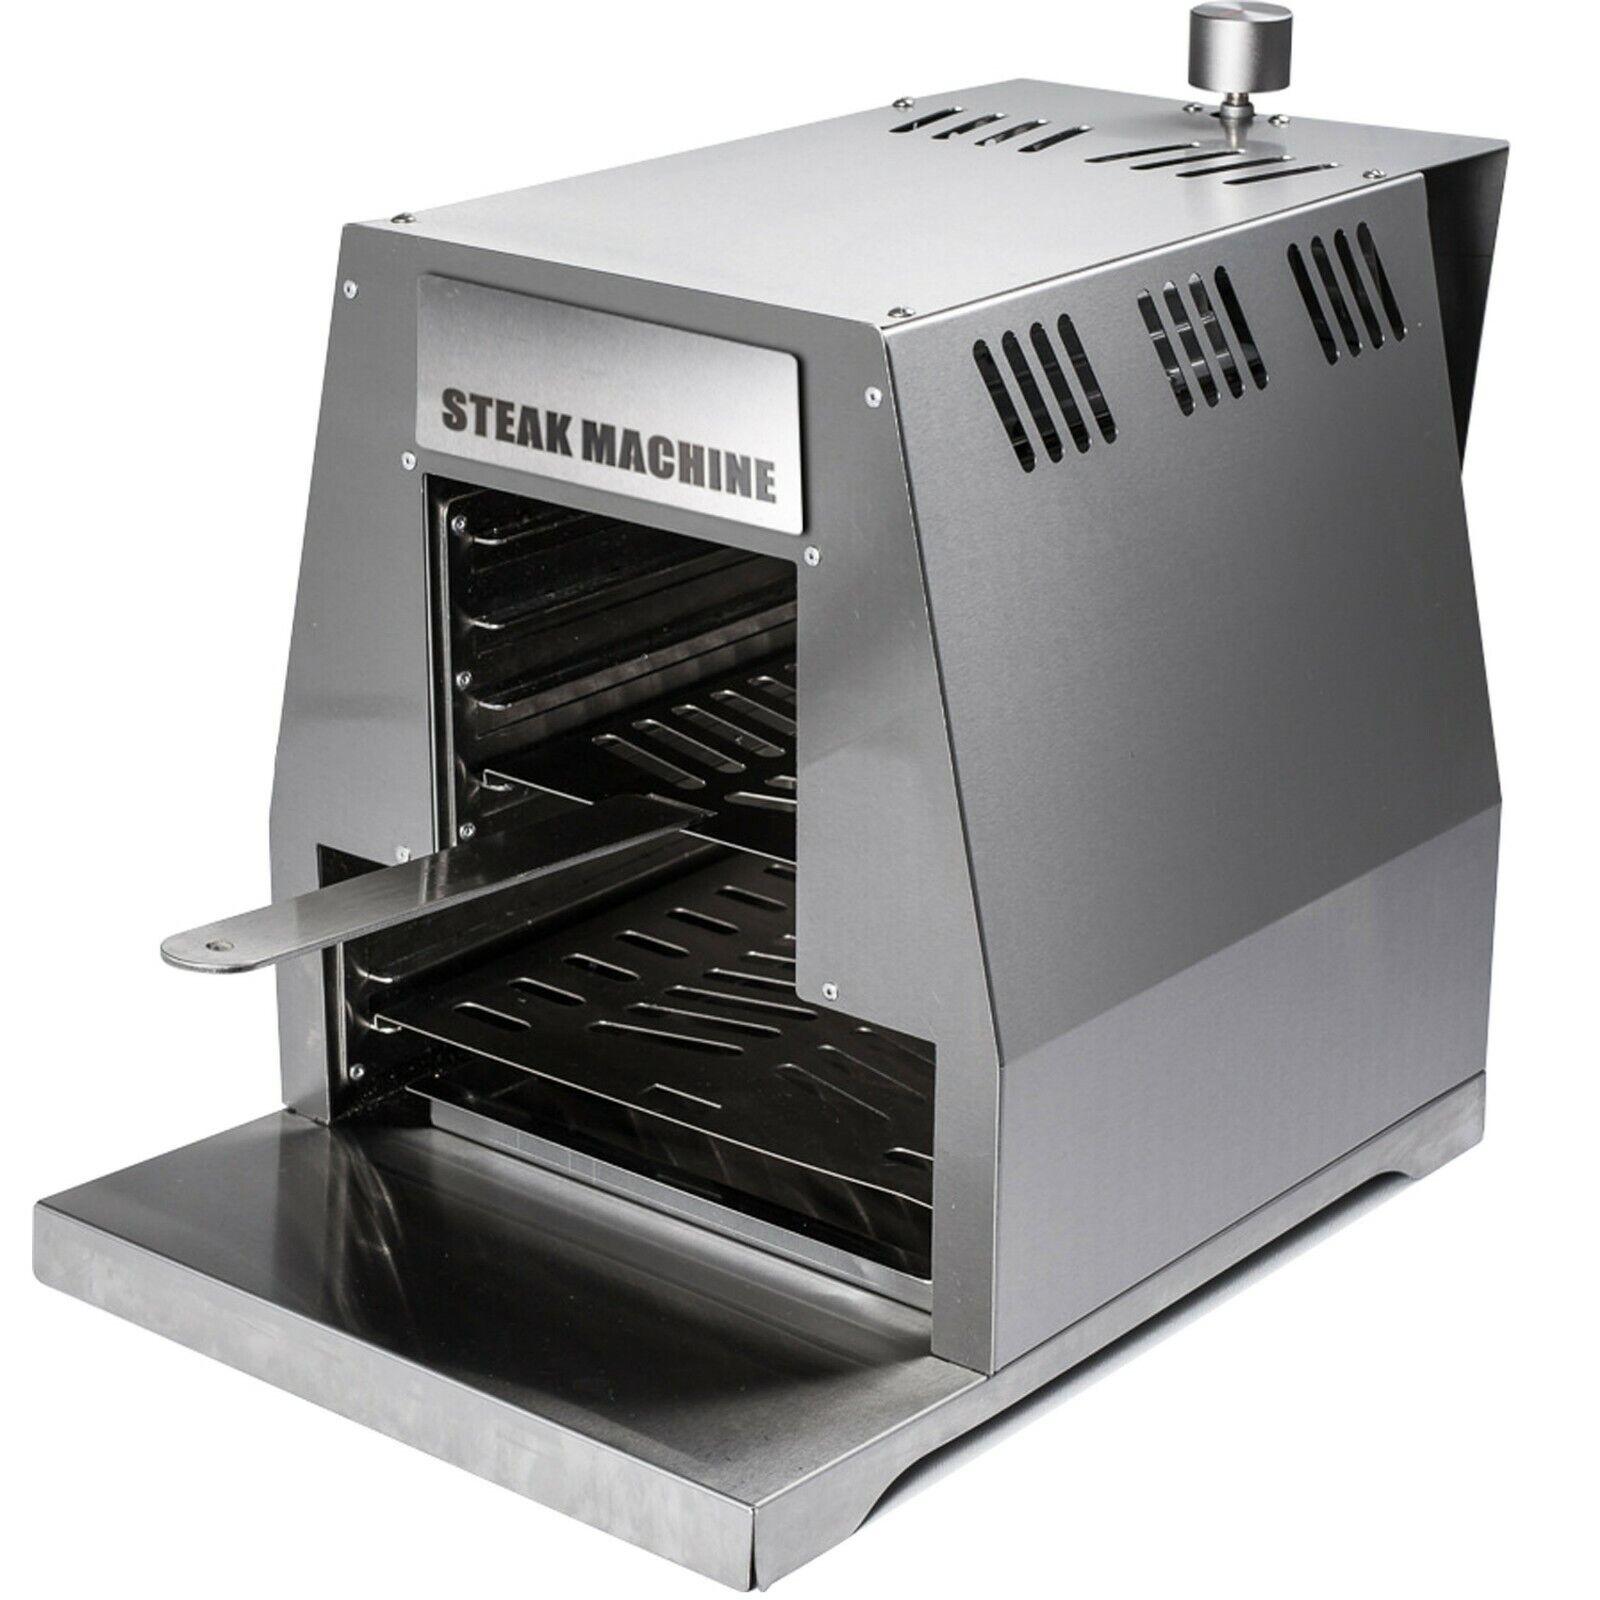 Activa STEAK MACHINE Gasgrill  800° Oberhitze Edelstahl Steak Grill BBQ